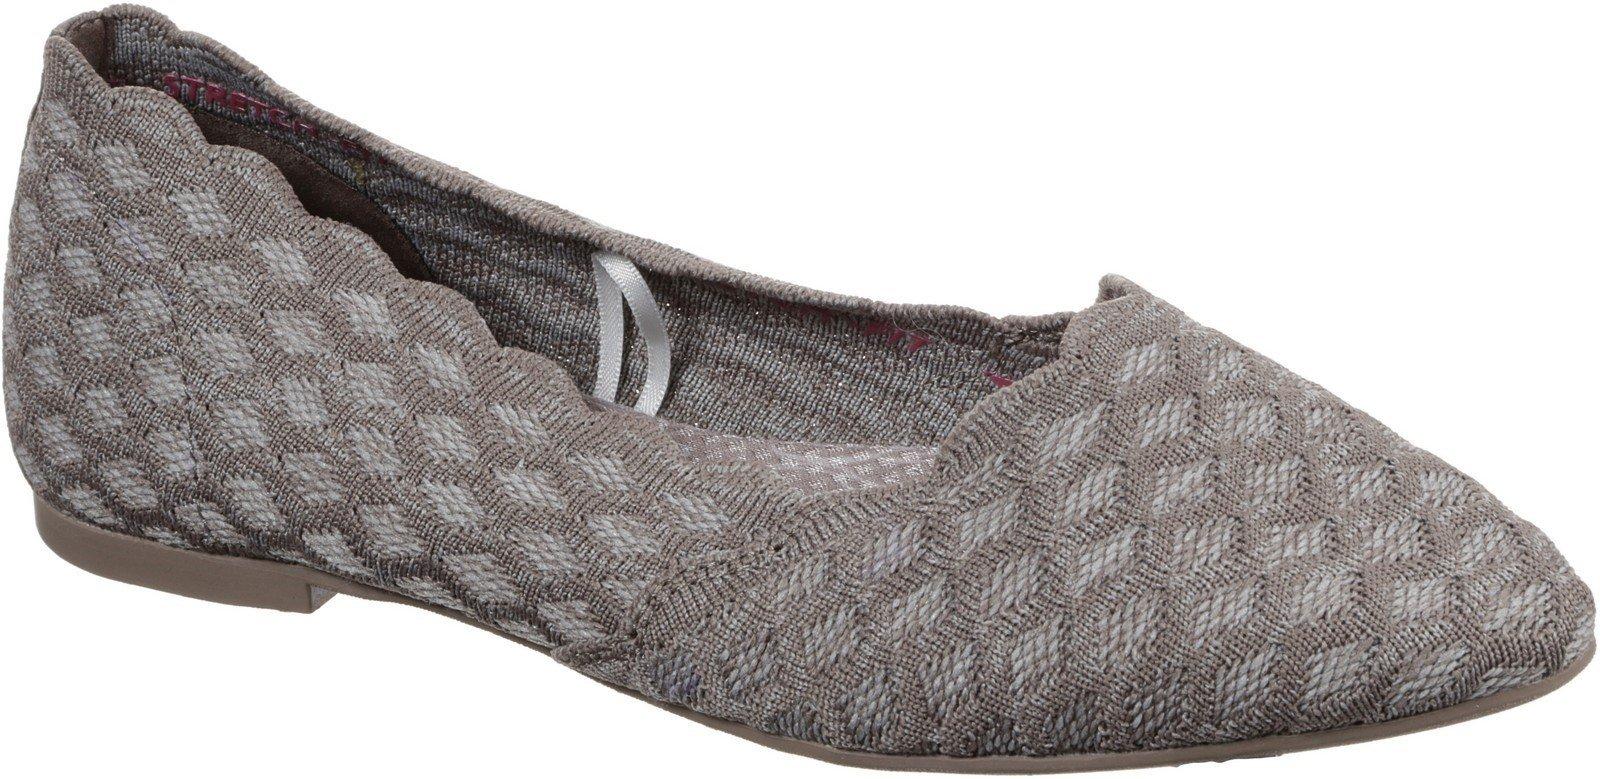 Skechers Women's Cleo Honeycomb Slip On Flat Shoe Taupe 30347 - Dark Taupe 3